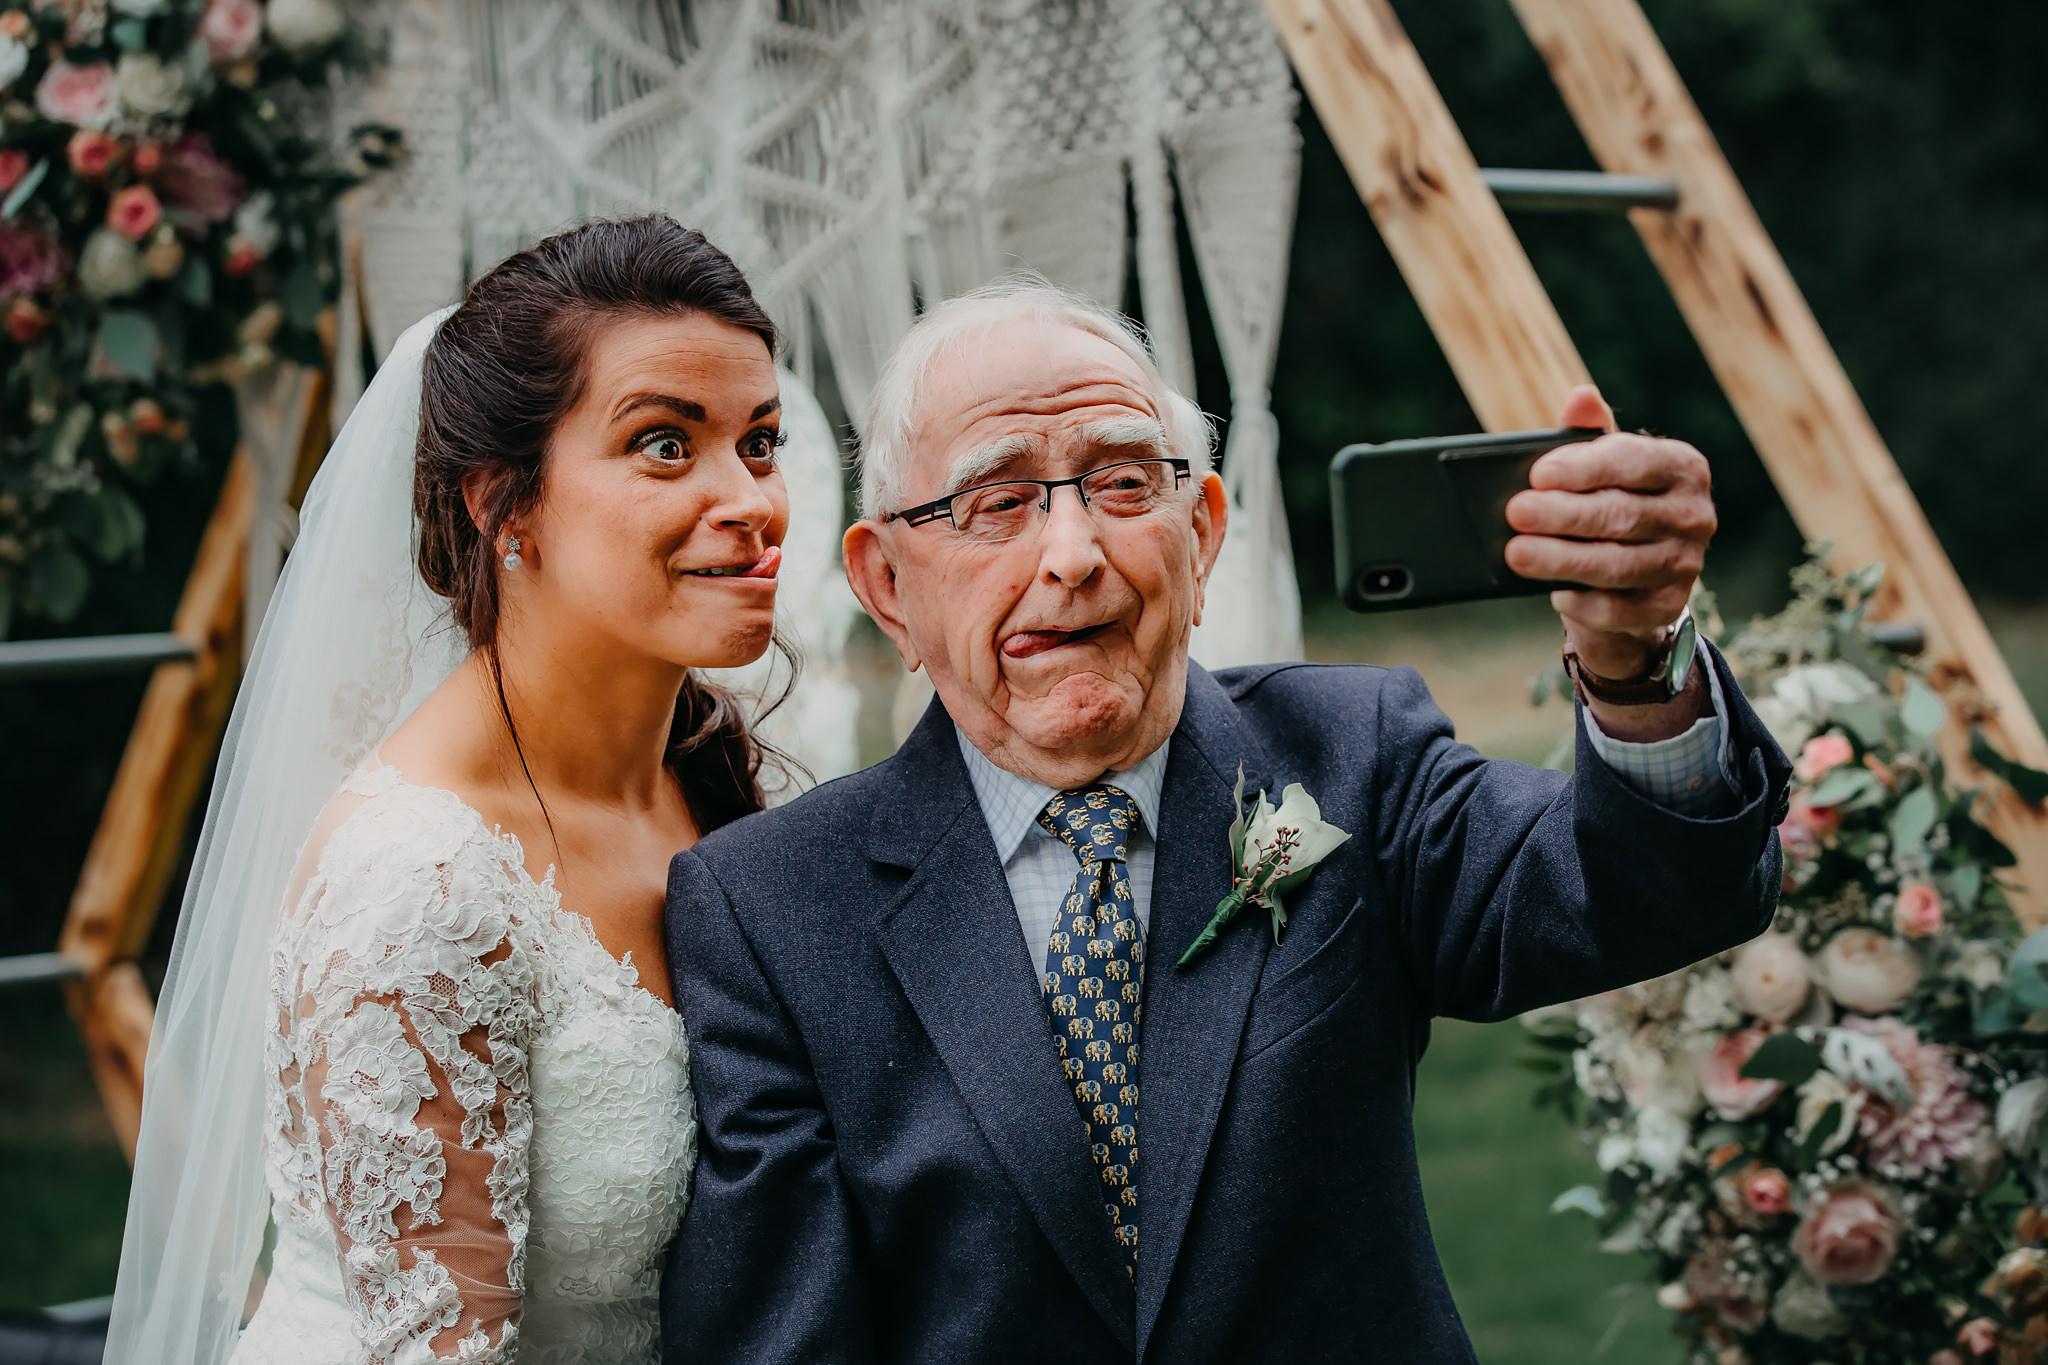 Bruidsreportage Bruidsfotografie Wedding Photographer 047 Bas Driessen Photography